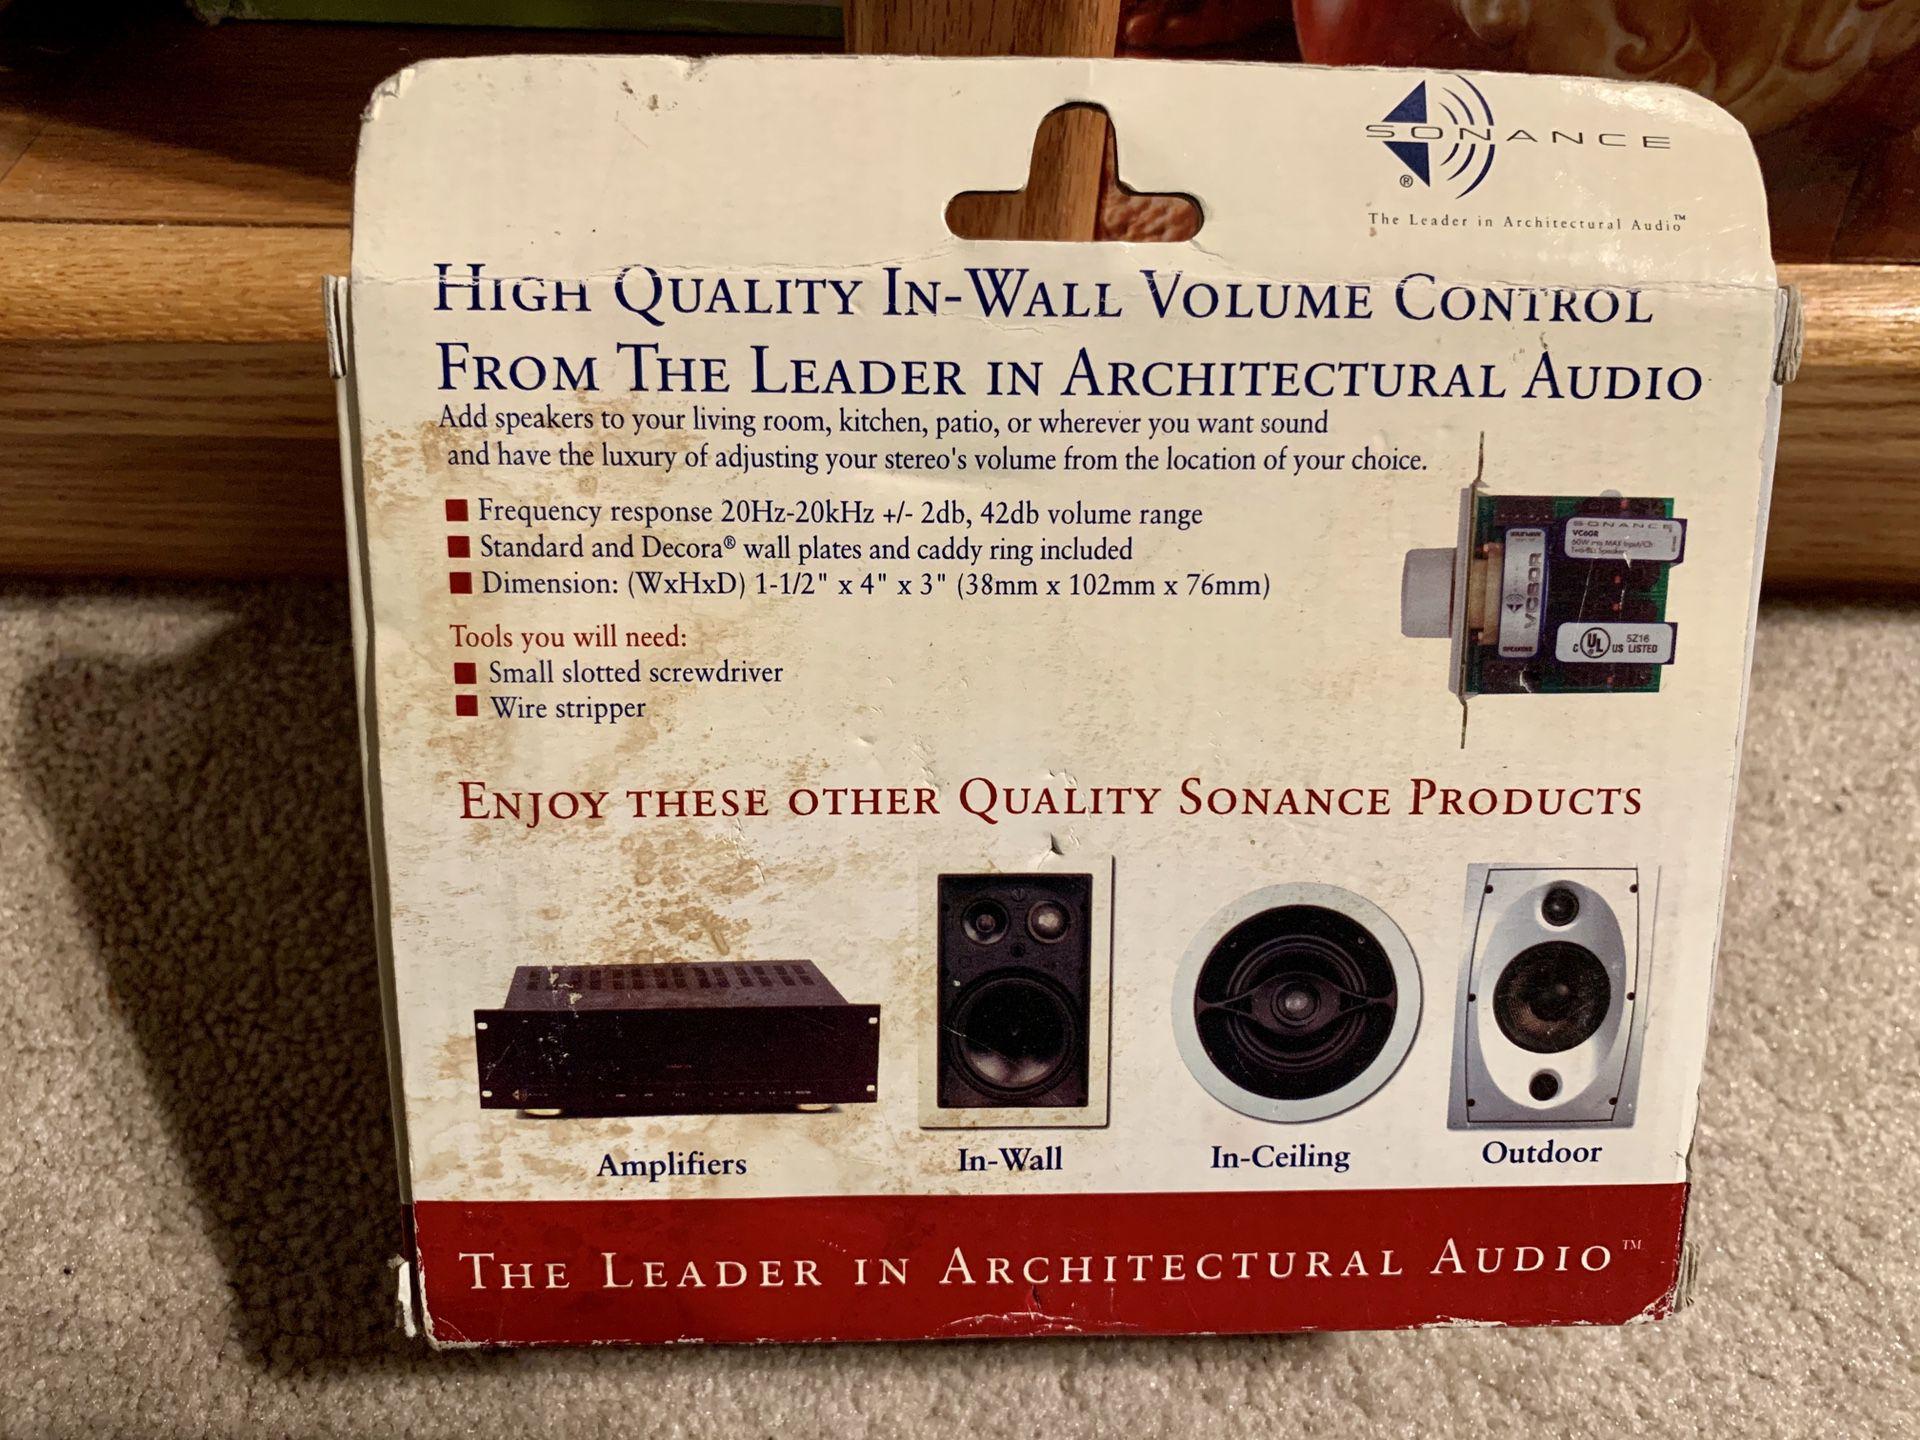 SONANCE 60 watt IN-WALL STEREO VOLUME CONTROL